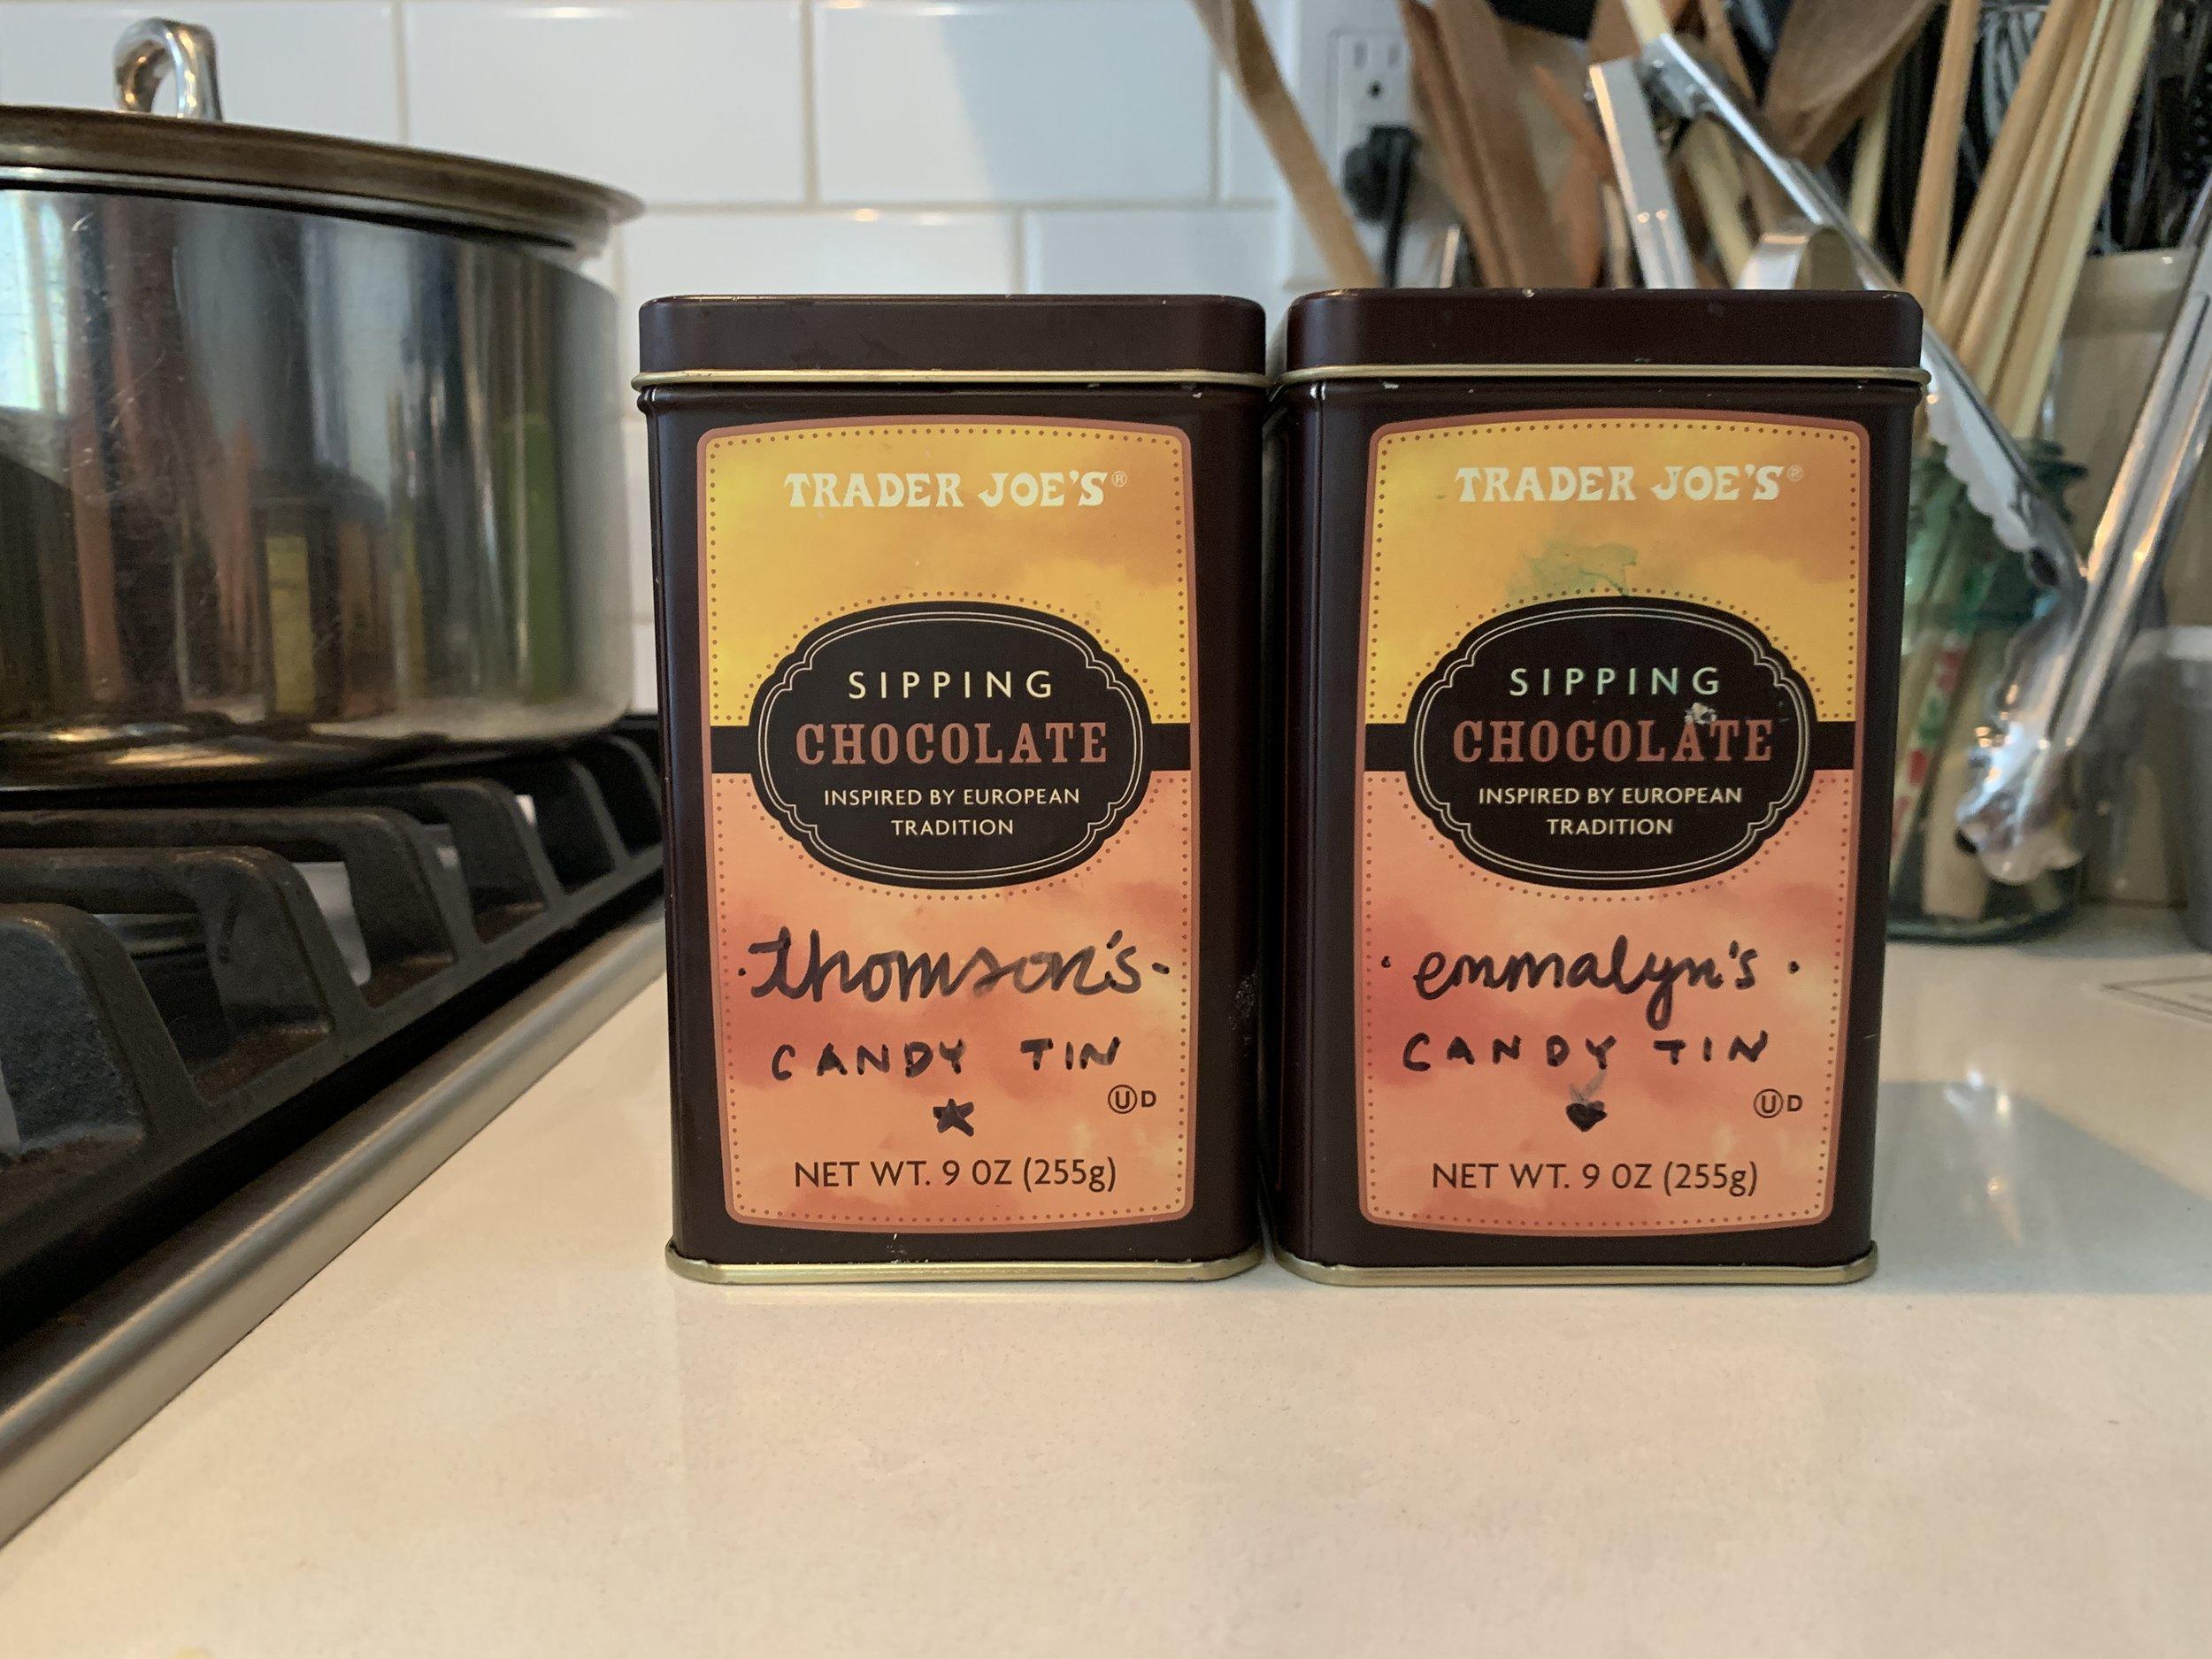 Recycled Trader Joe's hot cocoa powder tins for candy tins